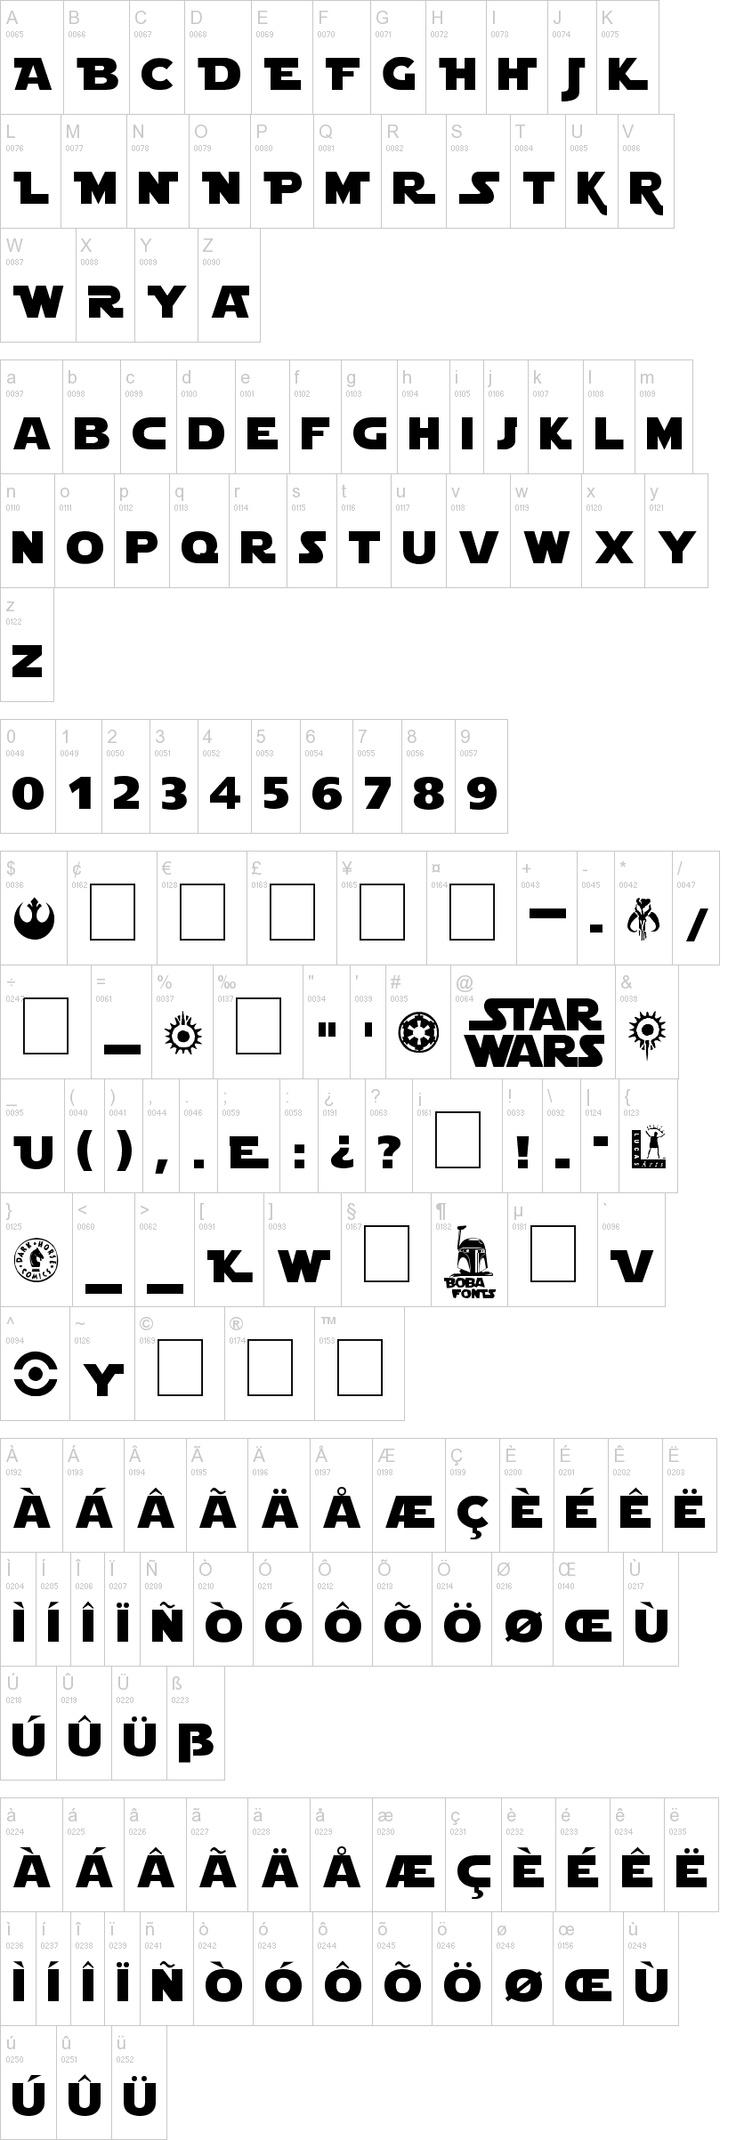 1000+ ideas about Star Wars Invitations on Pinterest